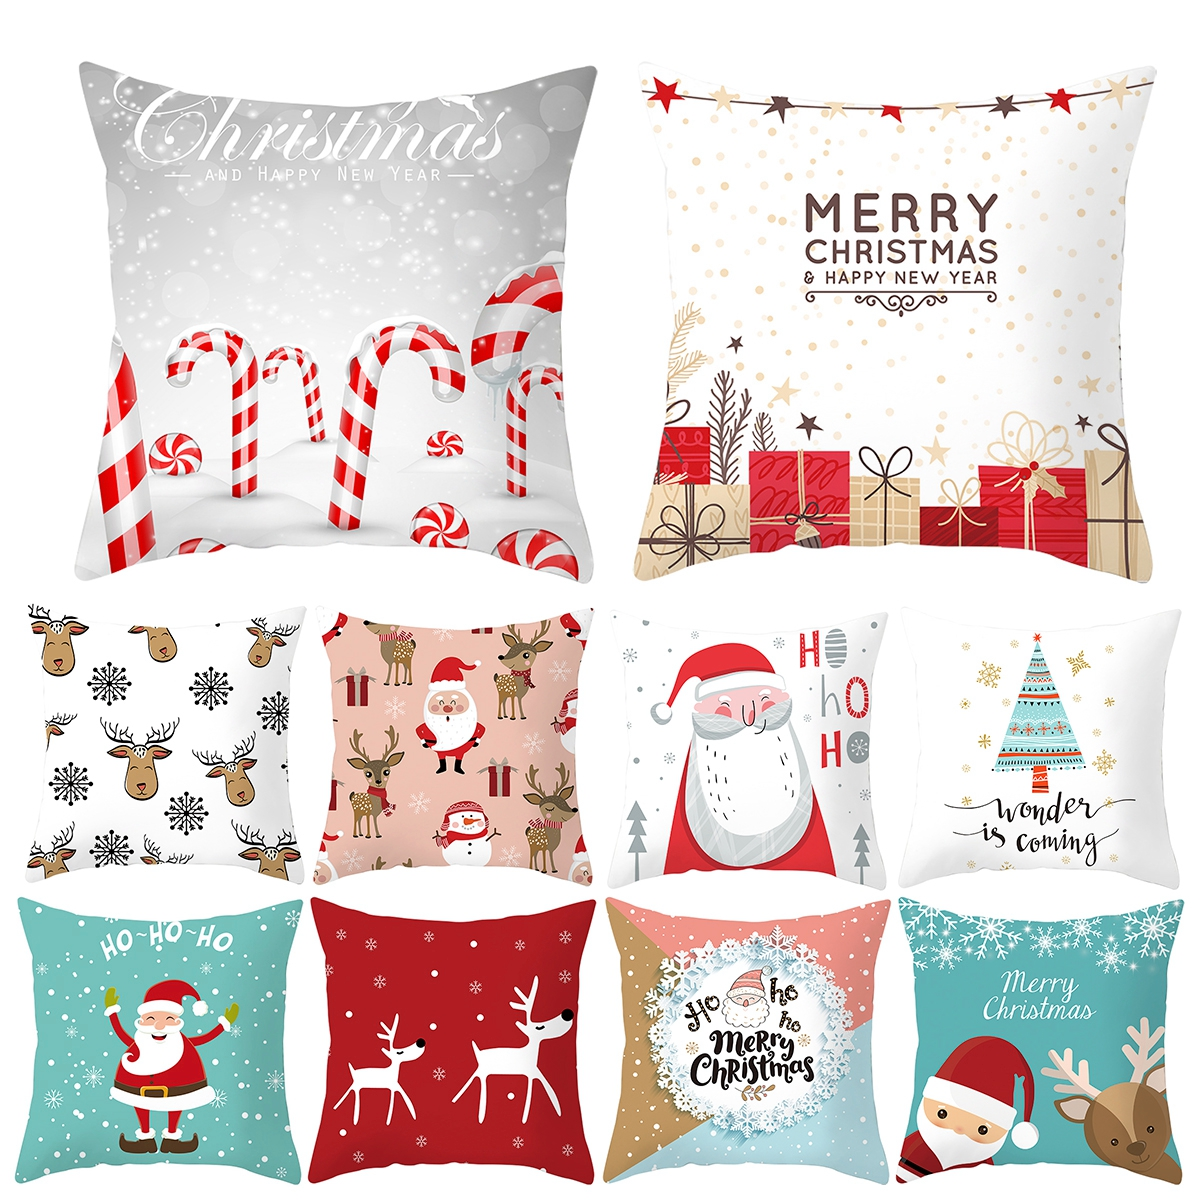 Hb4a78157c0014f45959d98ef2c87f6798 Christmas Pillow Coussin Cartoon Geometric Cushions Case Christmas Home Decorative Cushion For Sofa Xmas DIY Soft hug Pillowcase